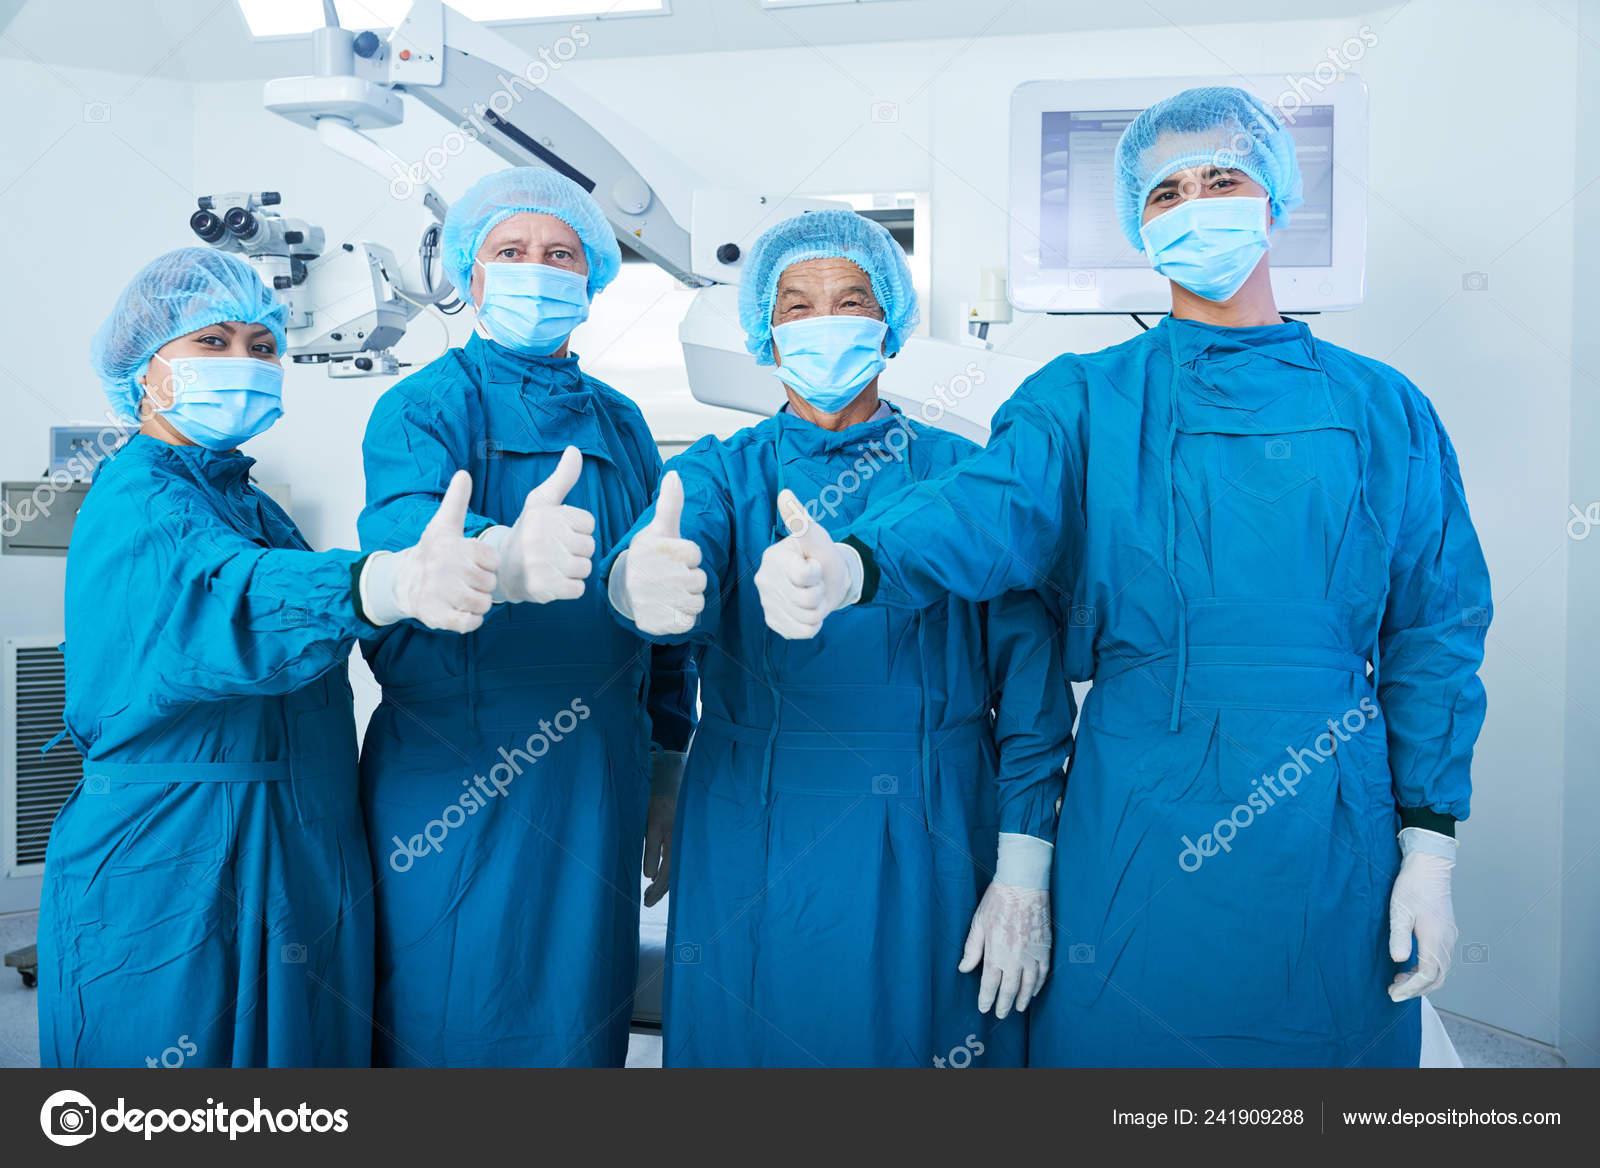 Team Asian Camera Uniform Looking Thumb Surgical Masks Showing